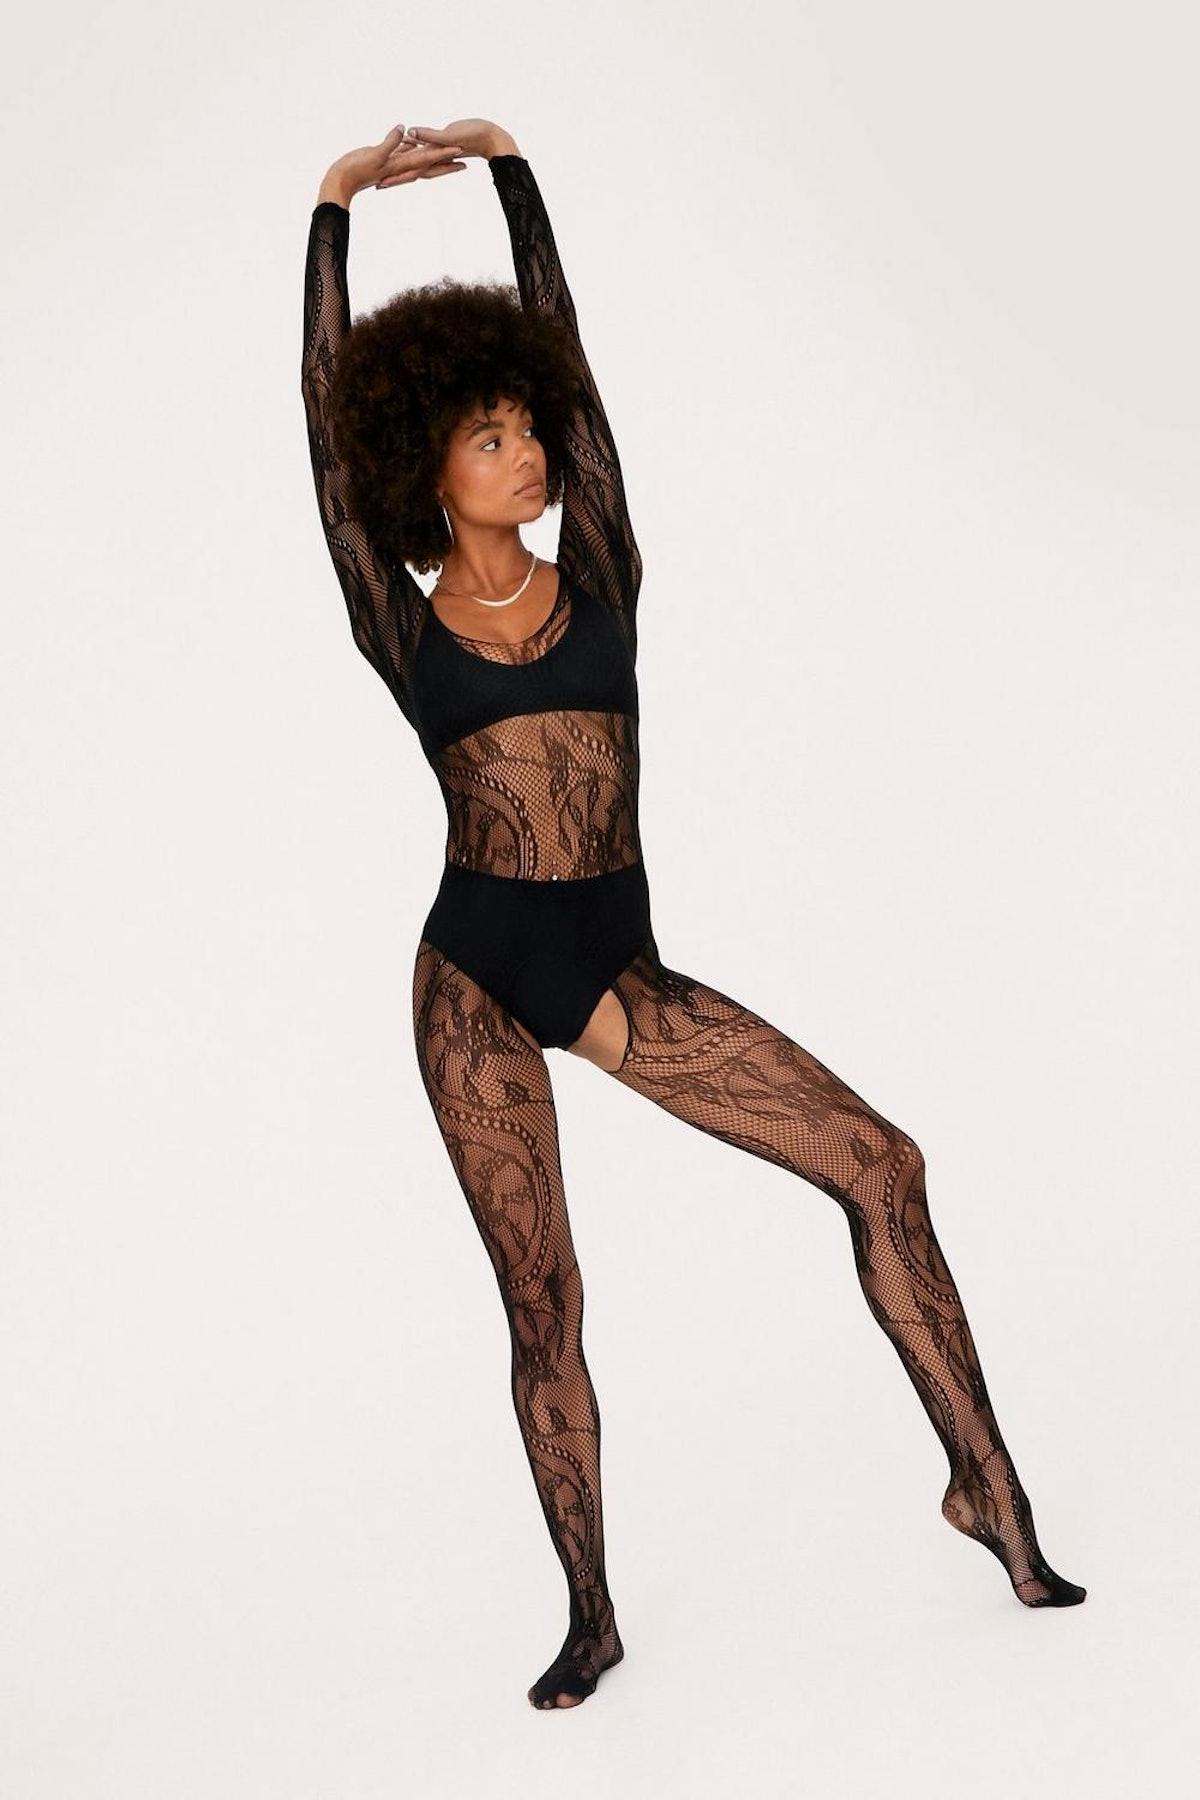 Nasty Gal x Tayce Mesh Lace Crotchless Body Stocking